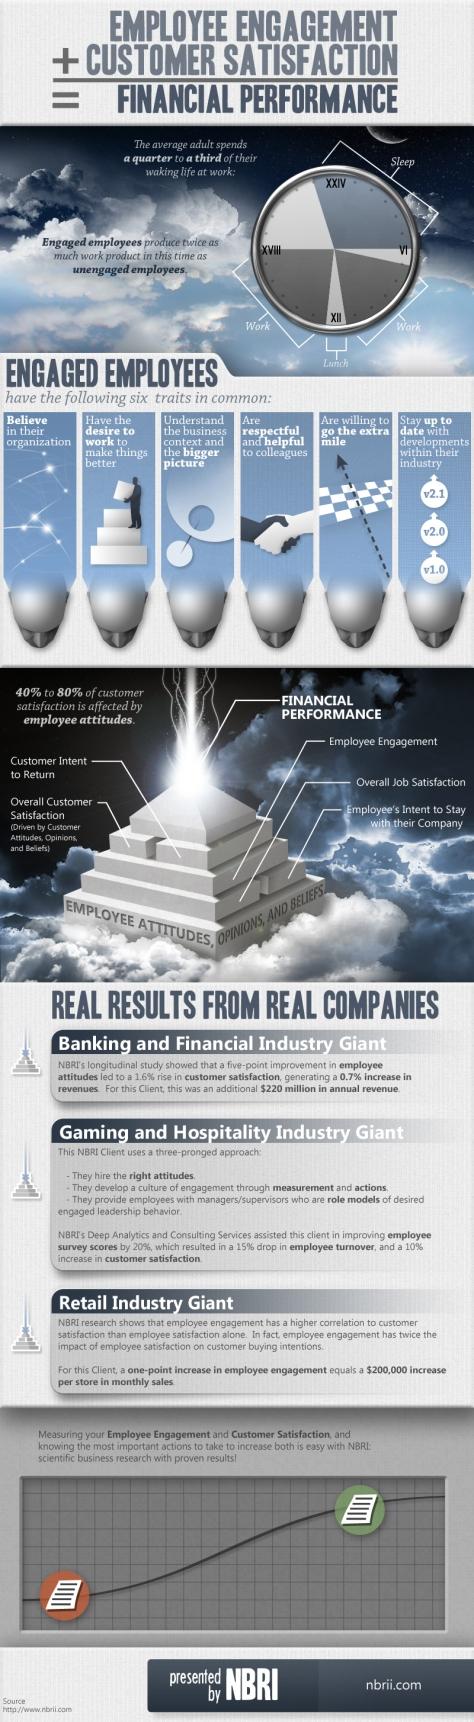 employee-engagement-customer-satisfaction-financial-performance_52592ff0450ba